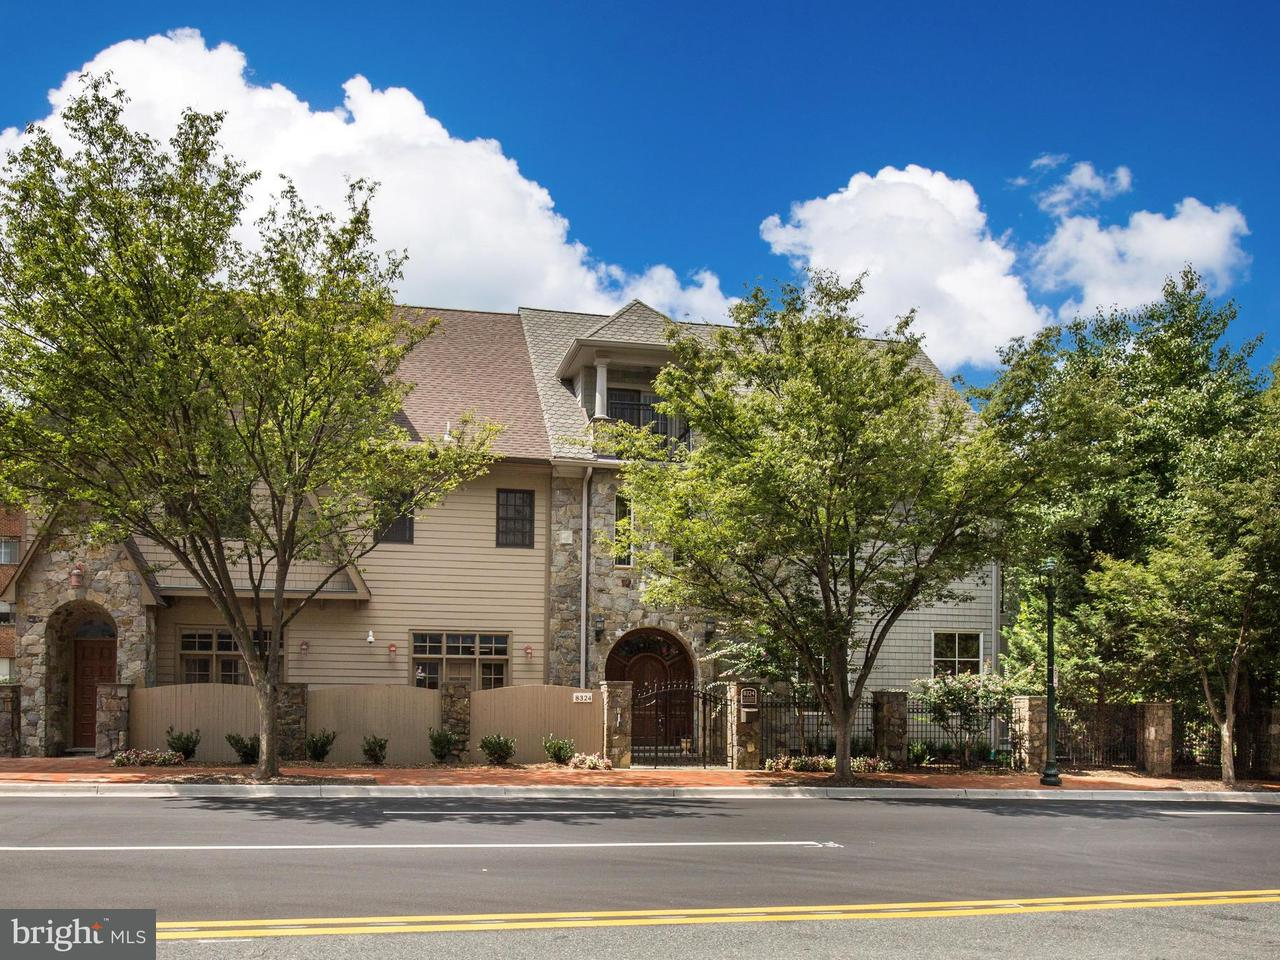 Duplex for Sale at 8324 WOODMONT AVE #1 8324 WOODMONT AVE #1 Bethesda, Maryland 20814 United States